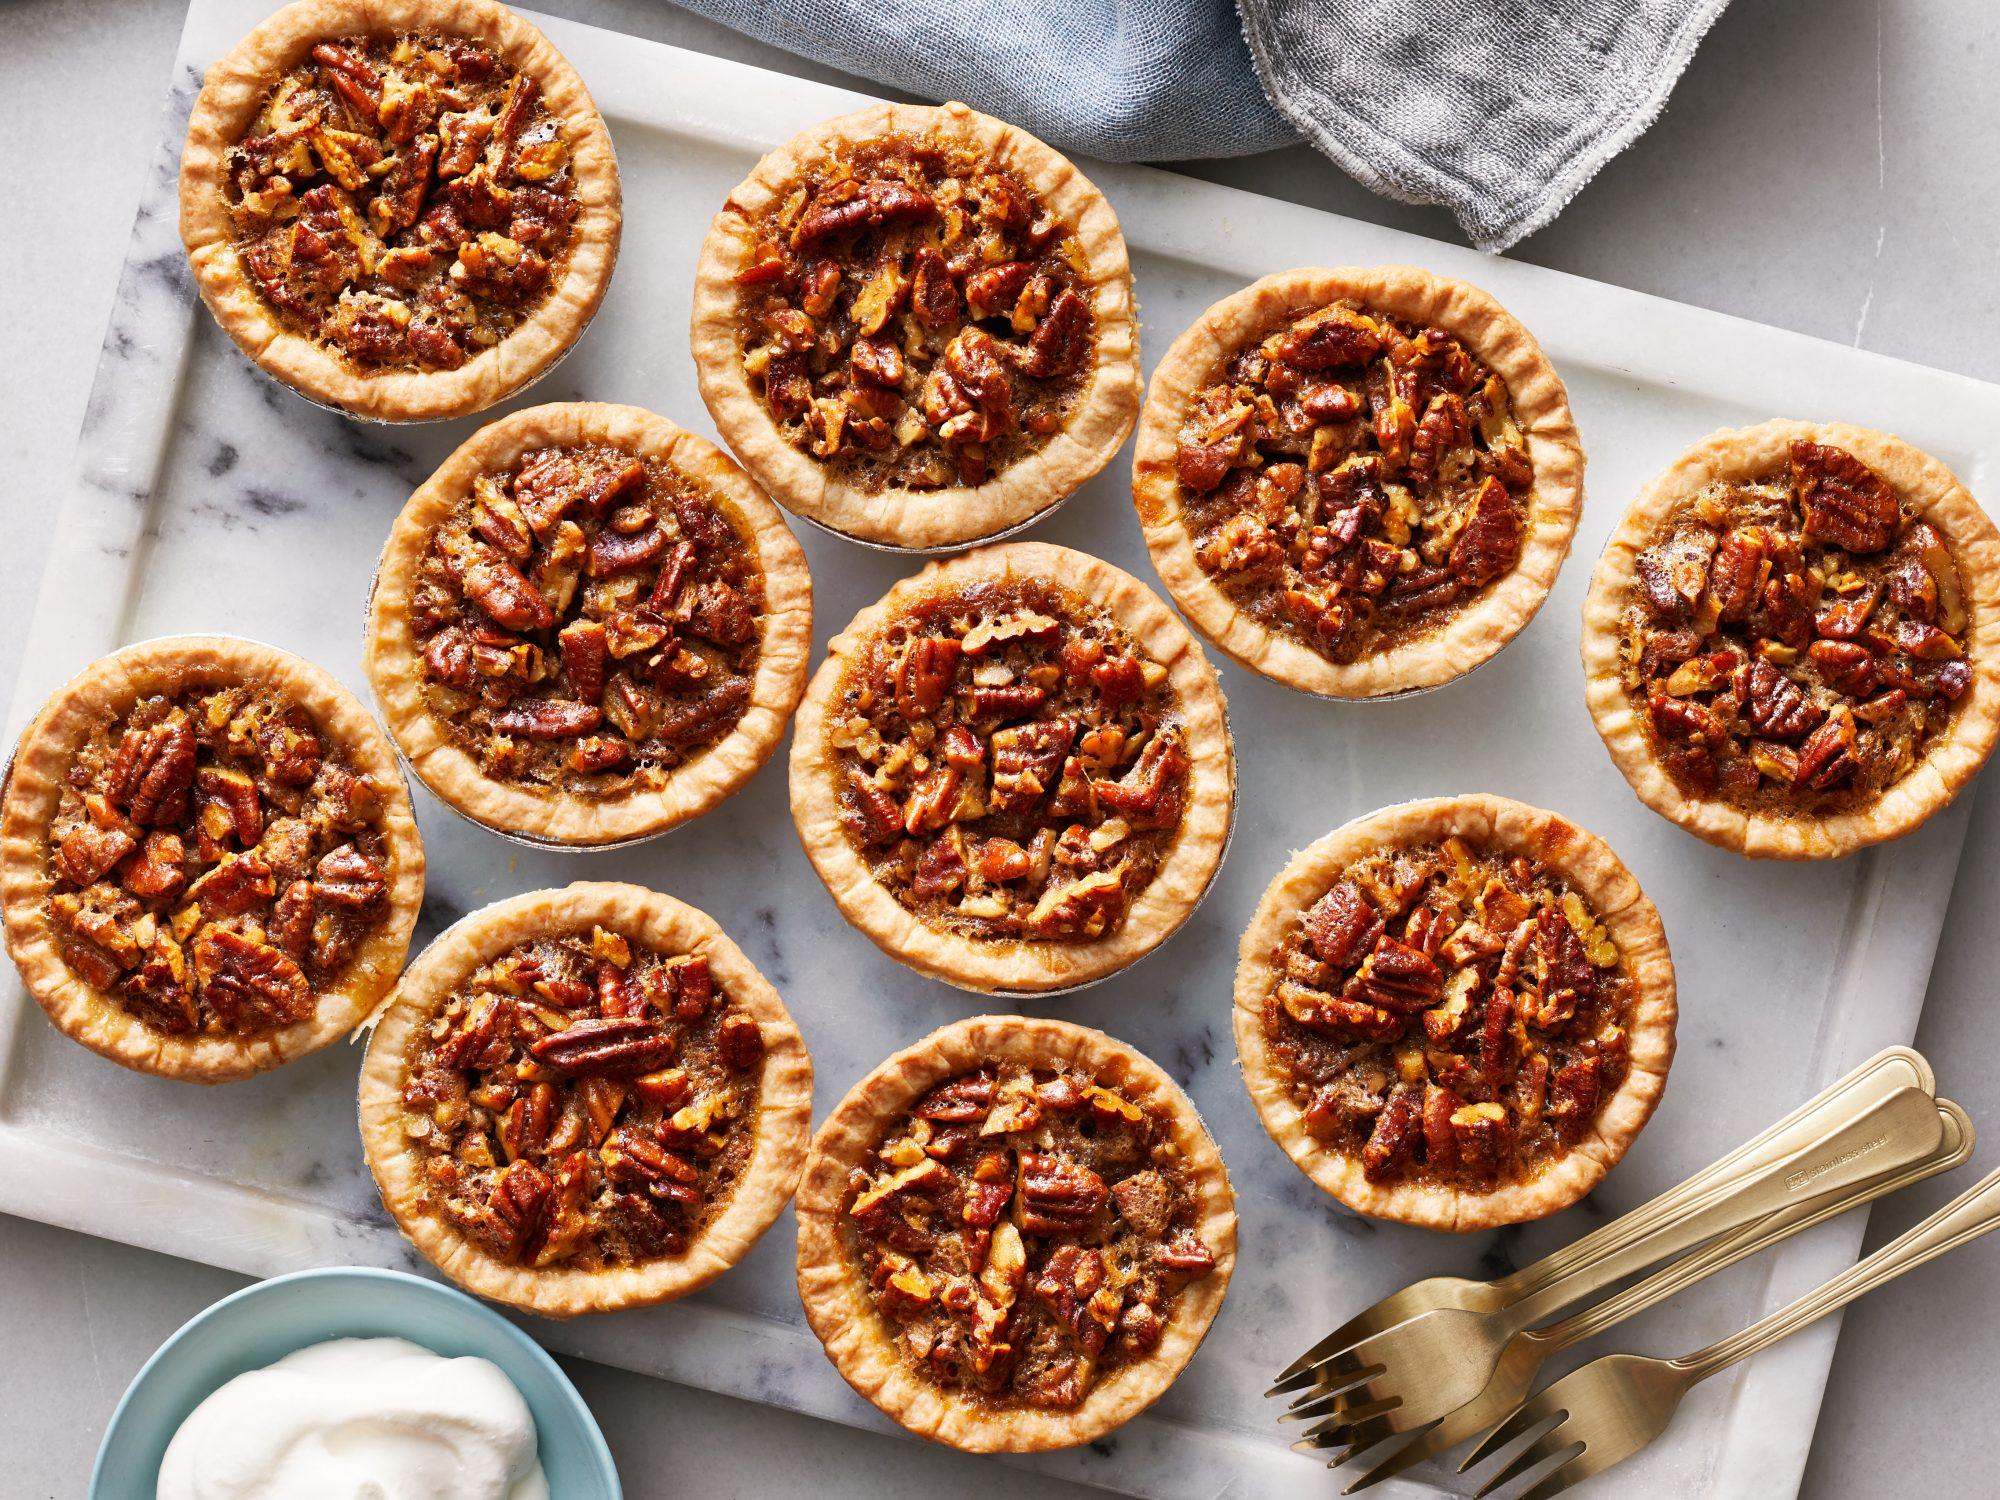 mr - Mini Pecan Pies reshoot